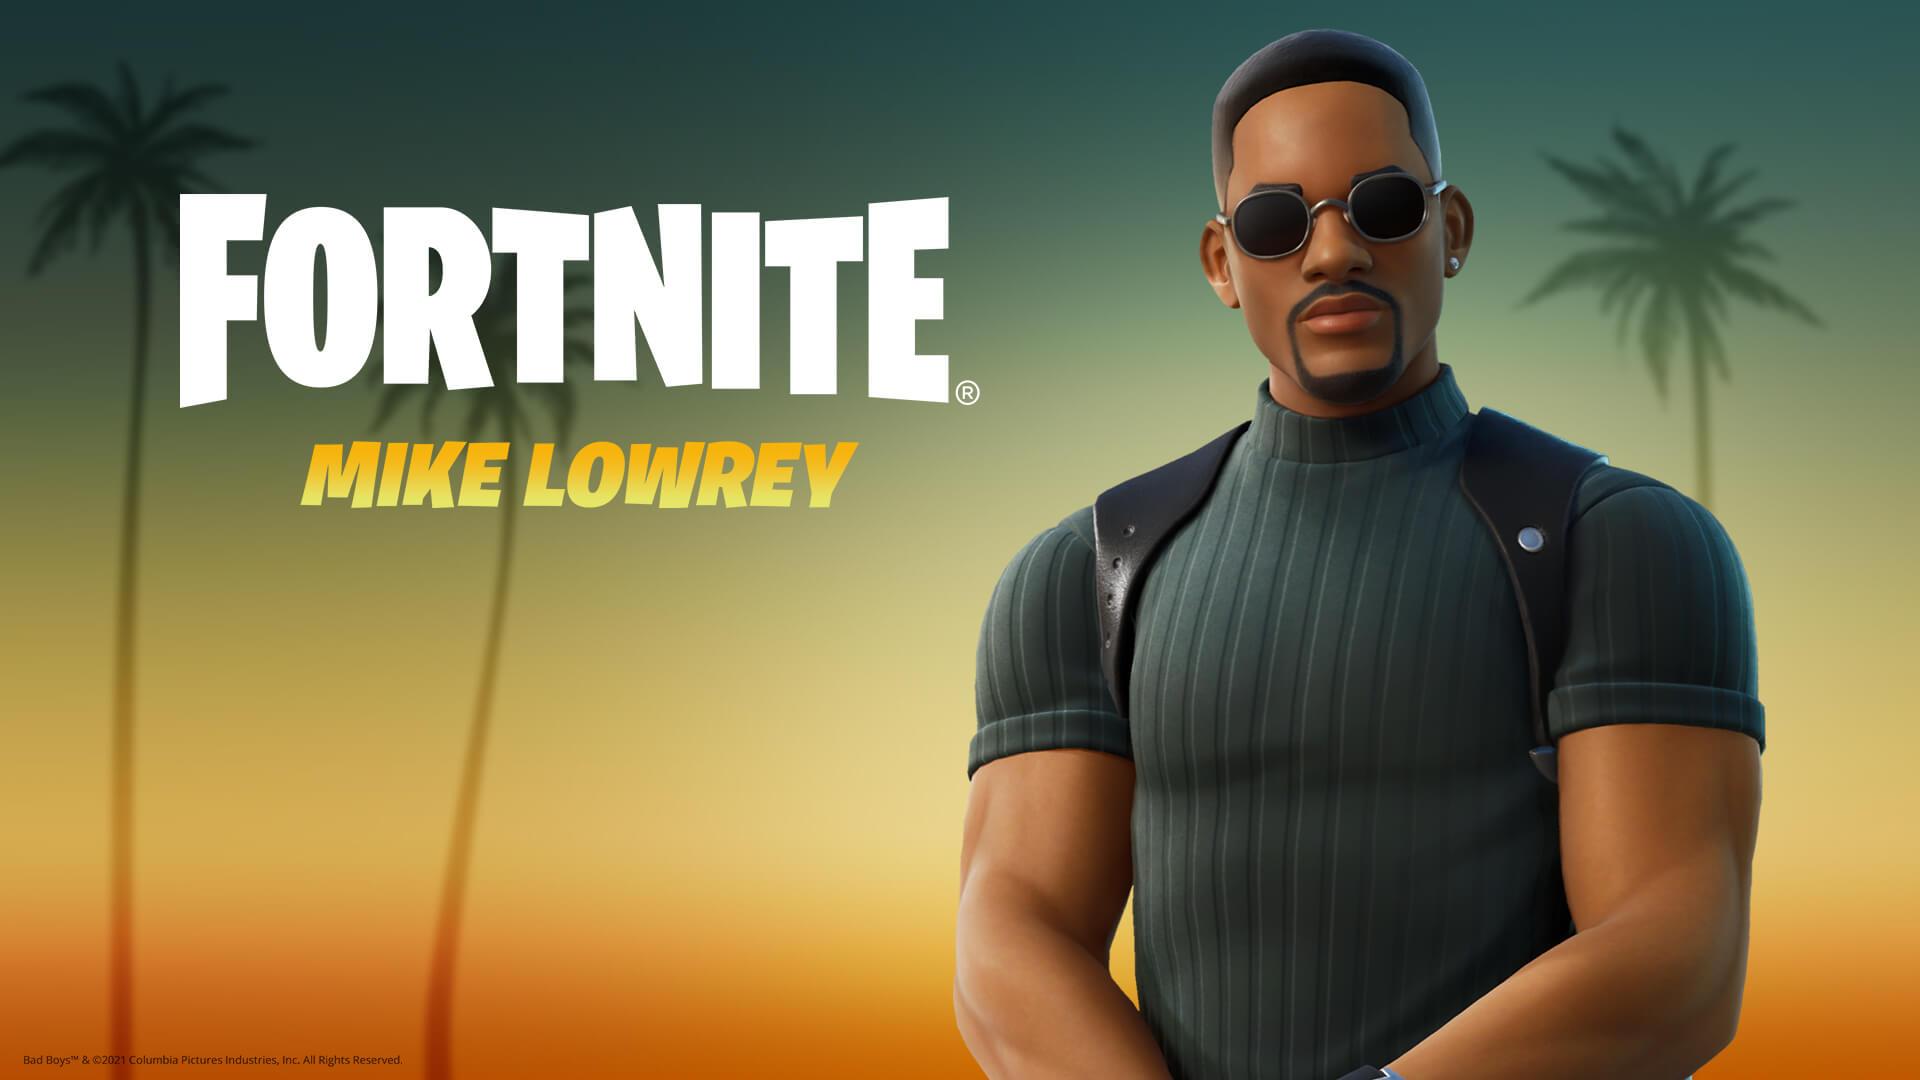 Mike Lowrey Fortnite